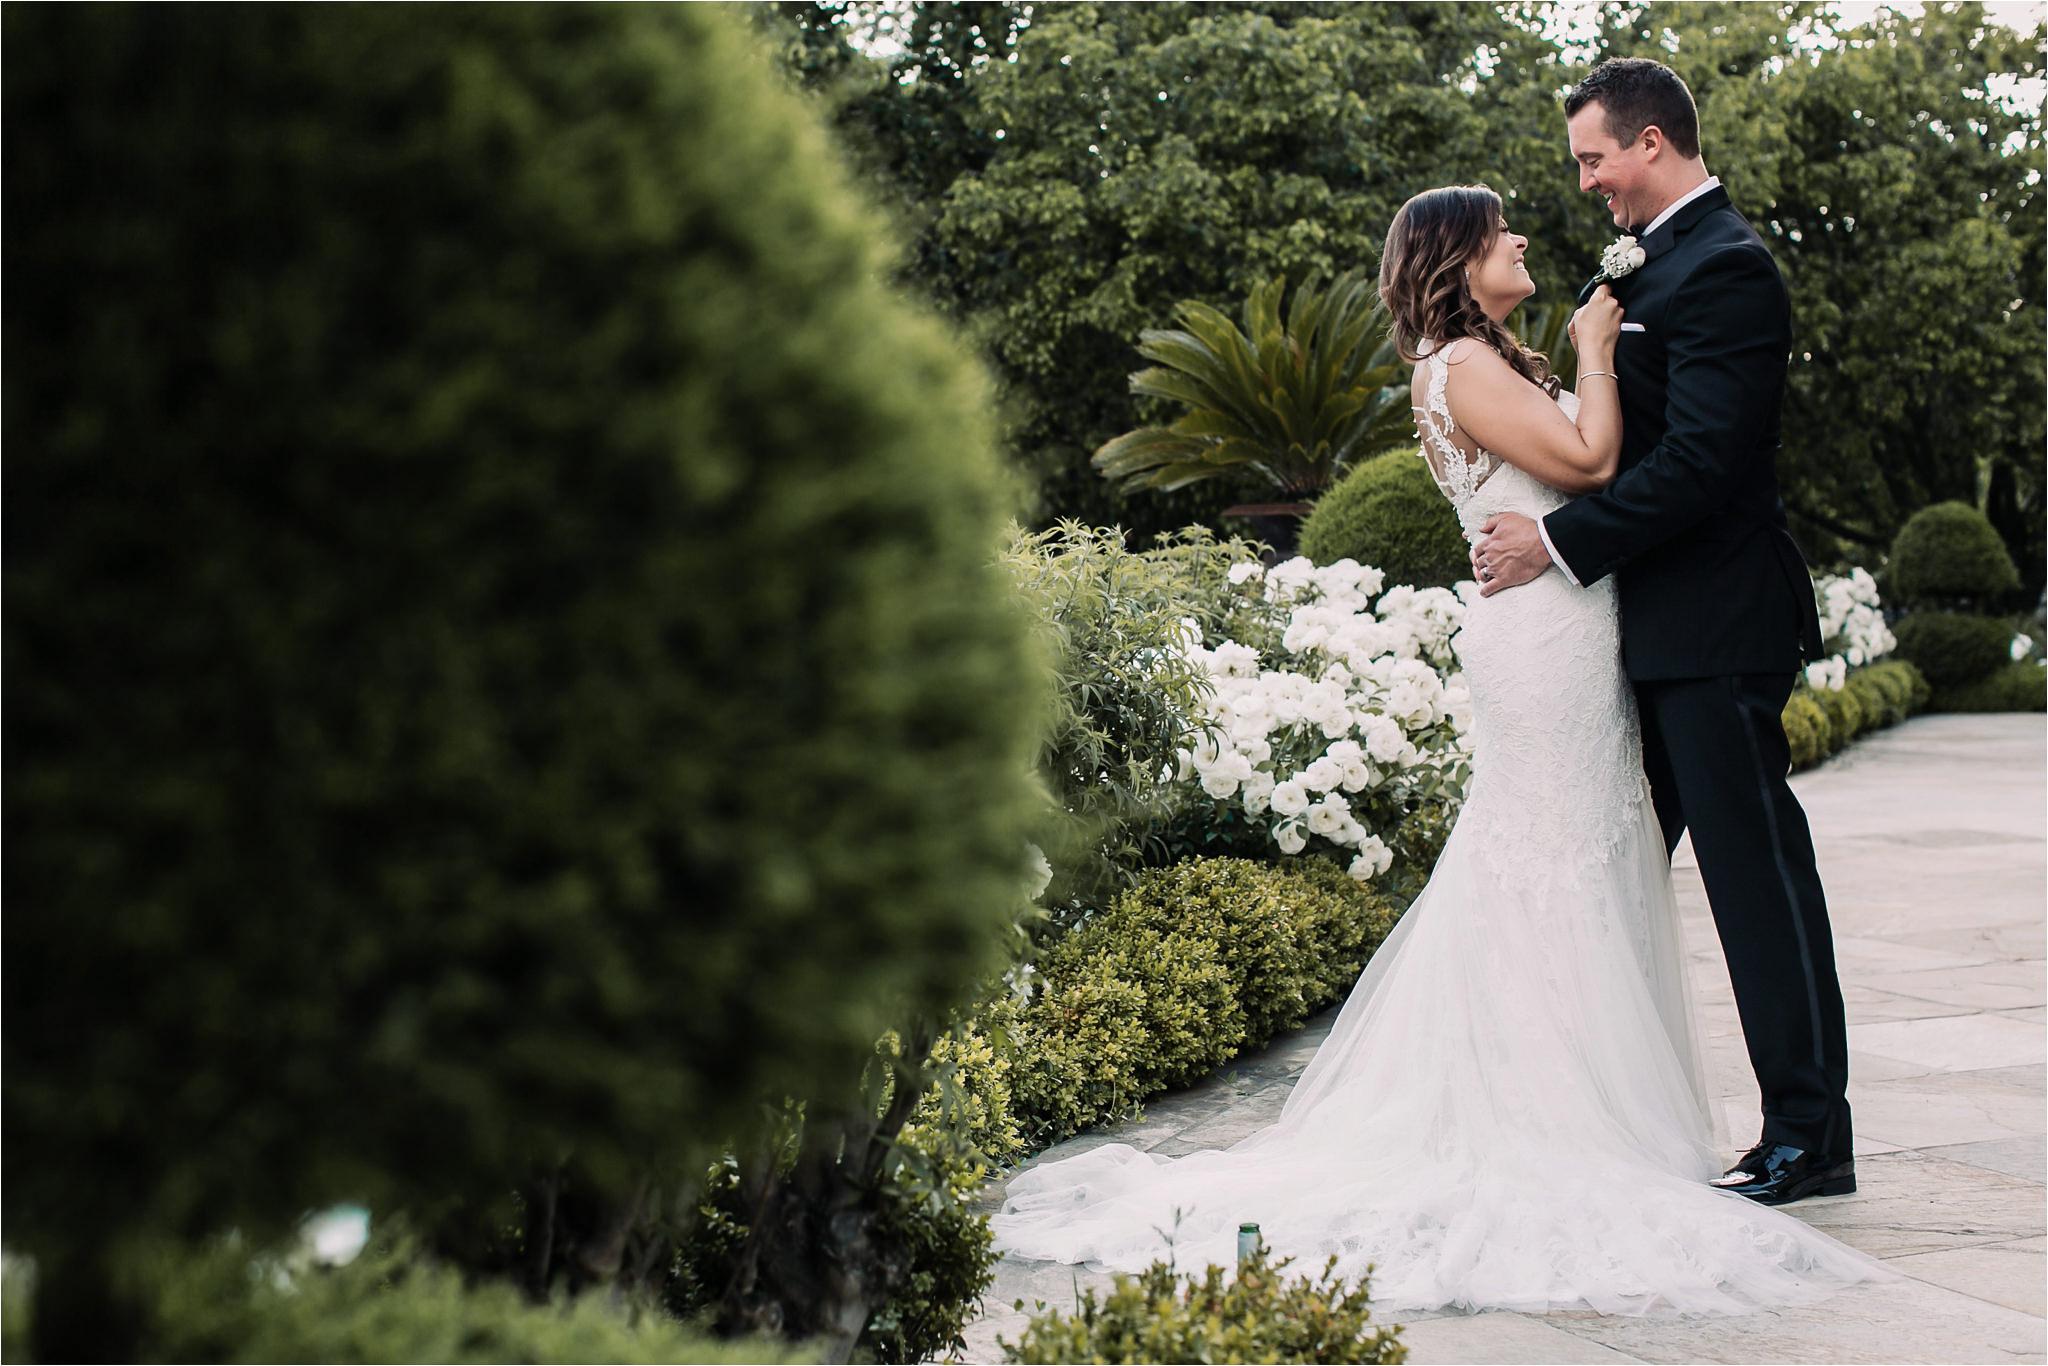 jessica-roman-photography-arden hills wedding photograpger-sacramento-boise-35.jpg